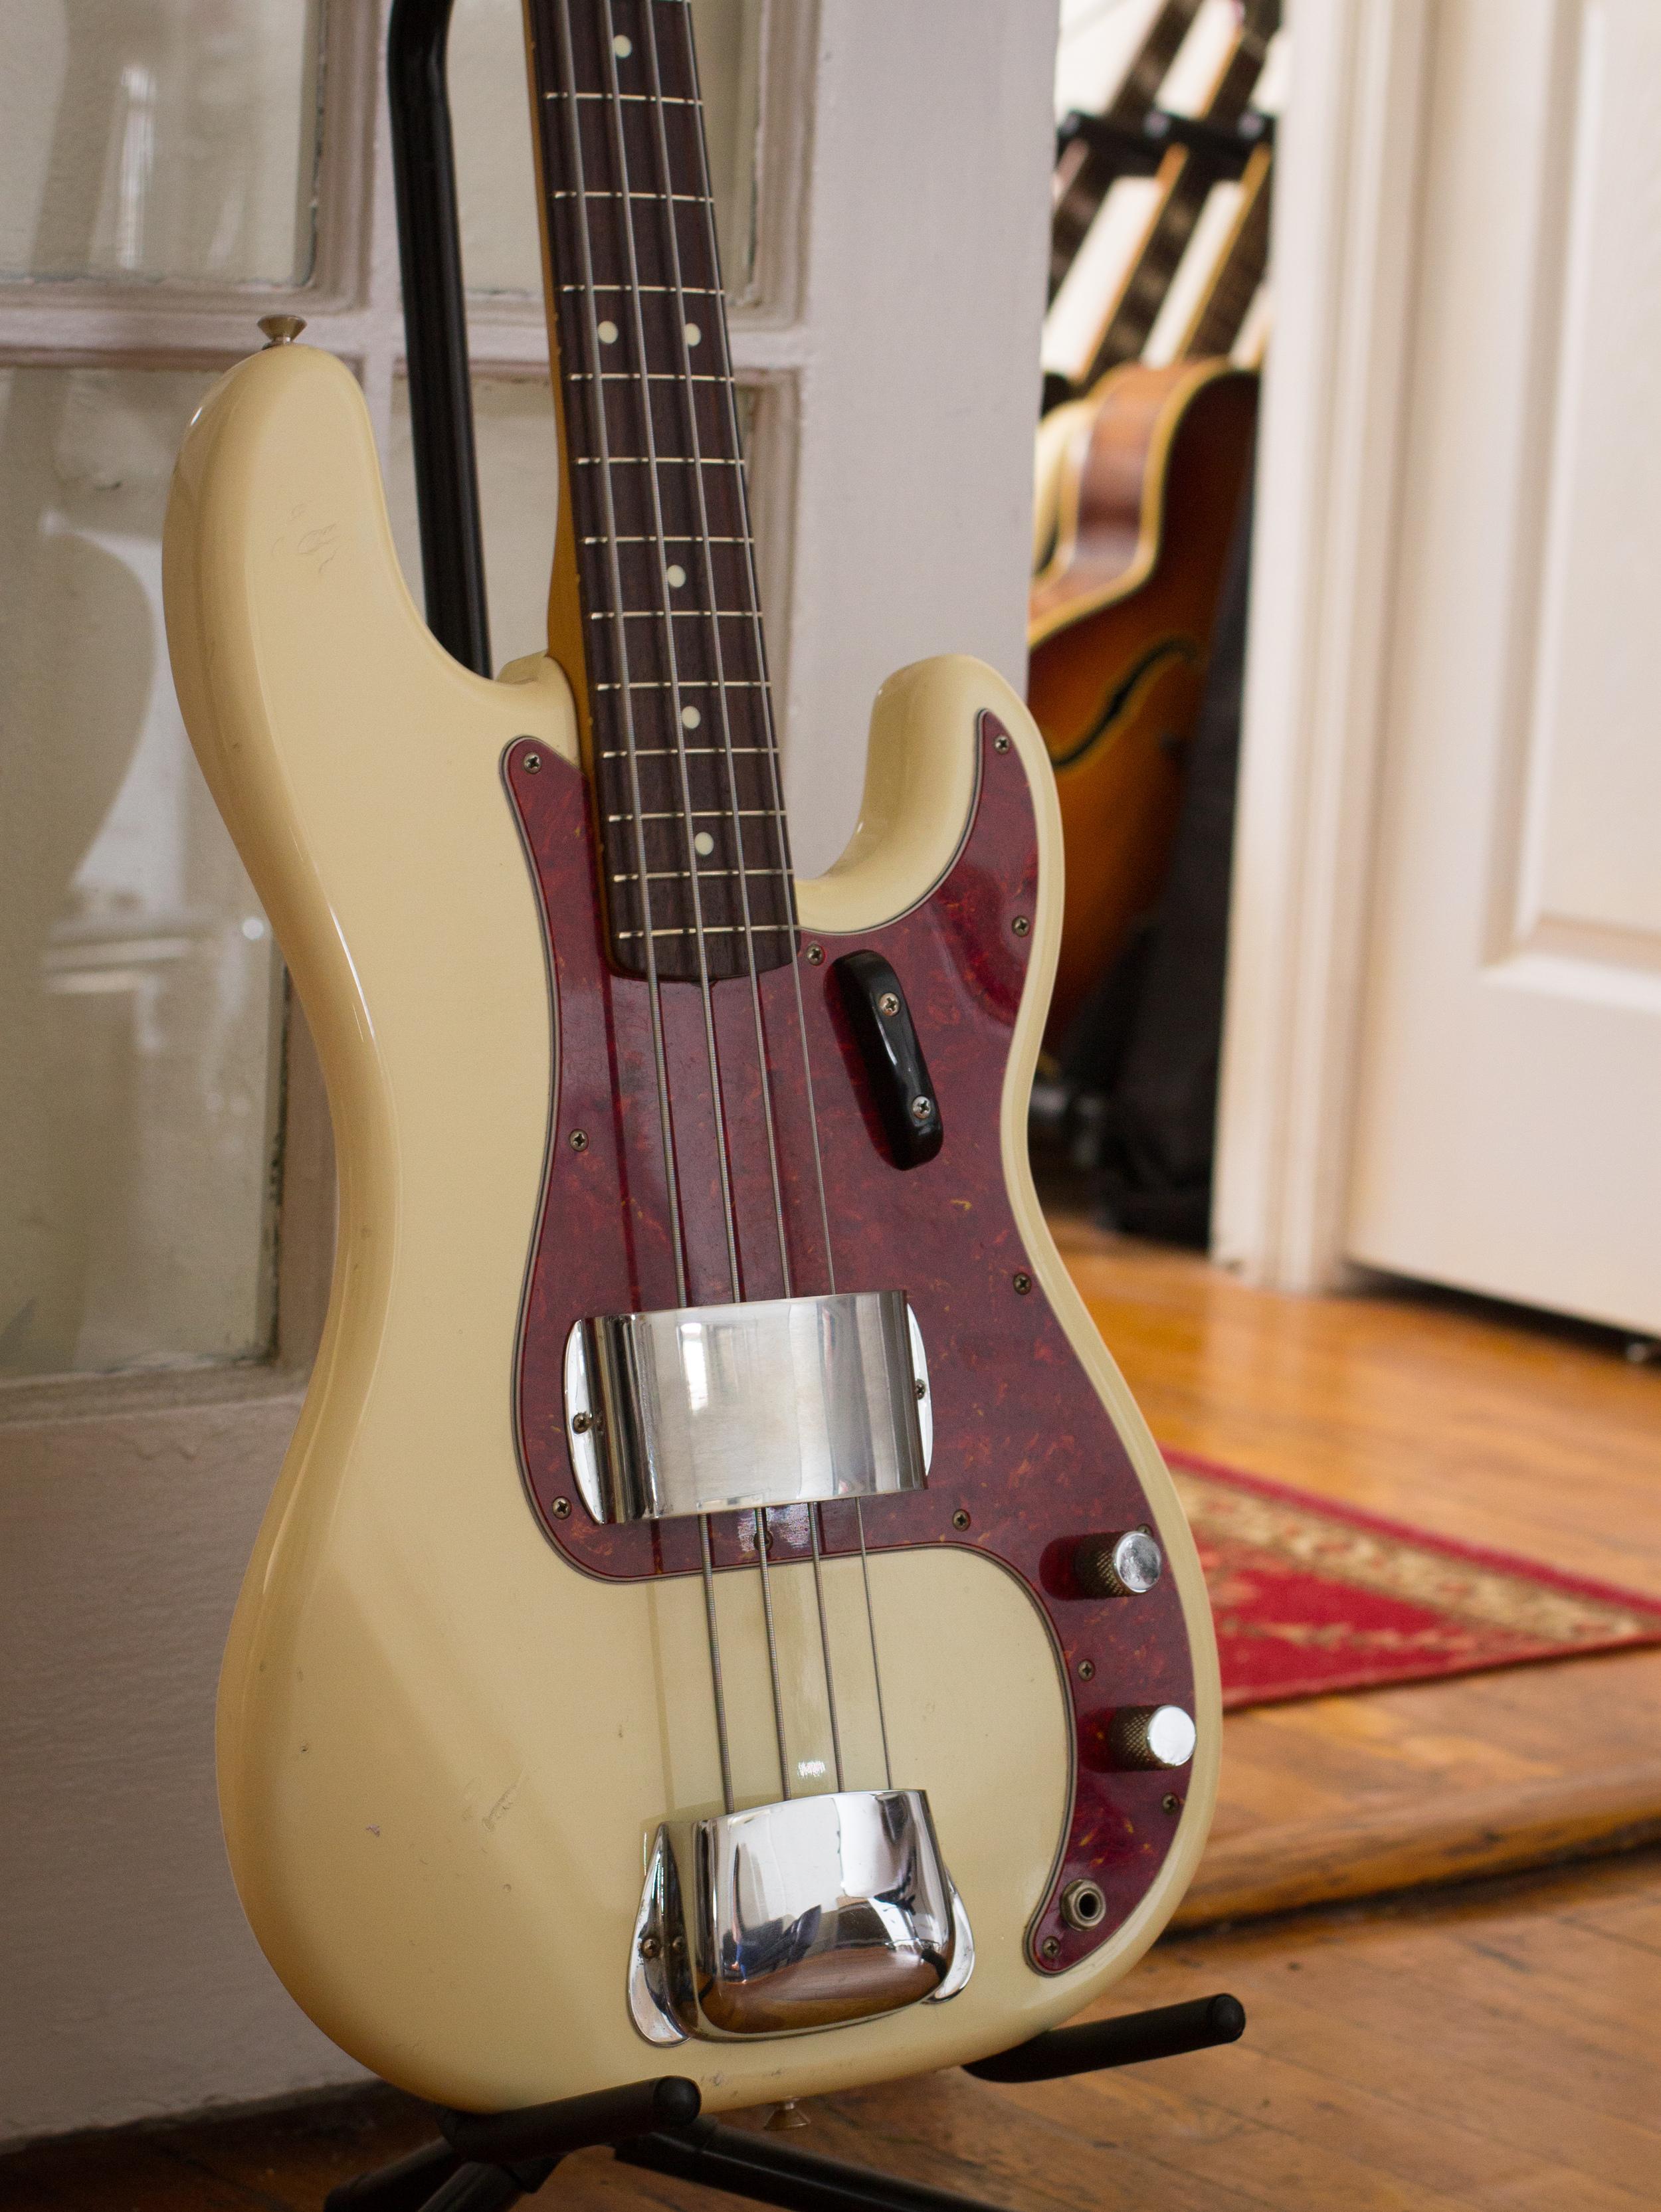 1989 Fender Precision Bass, '62 Reissue